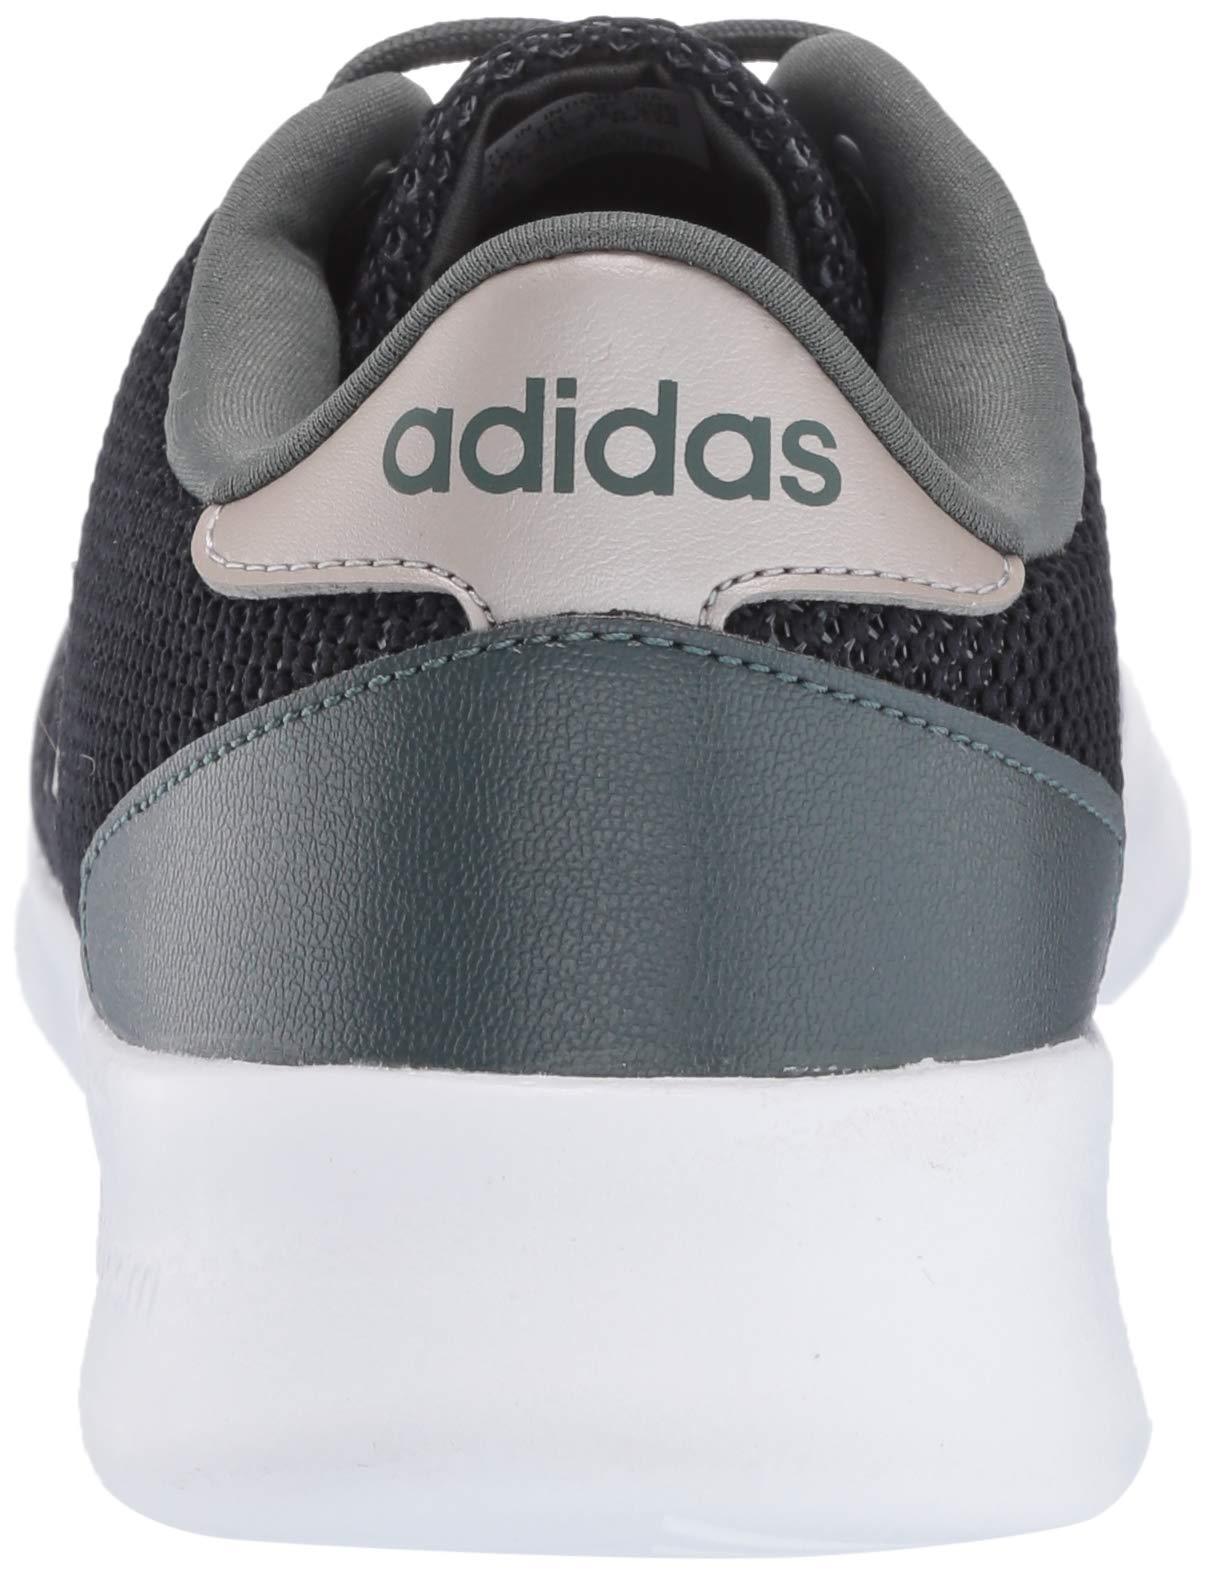 adidas Women's Cloudfoam QT Racer, Legend Ivy/Platino Metallic/Black, 5.5 M US by adidas (Image #2)